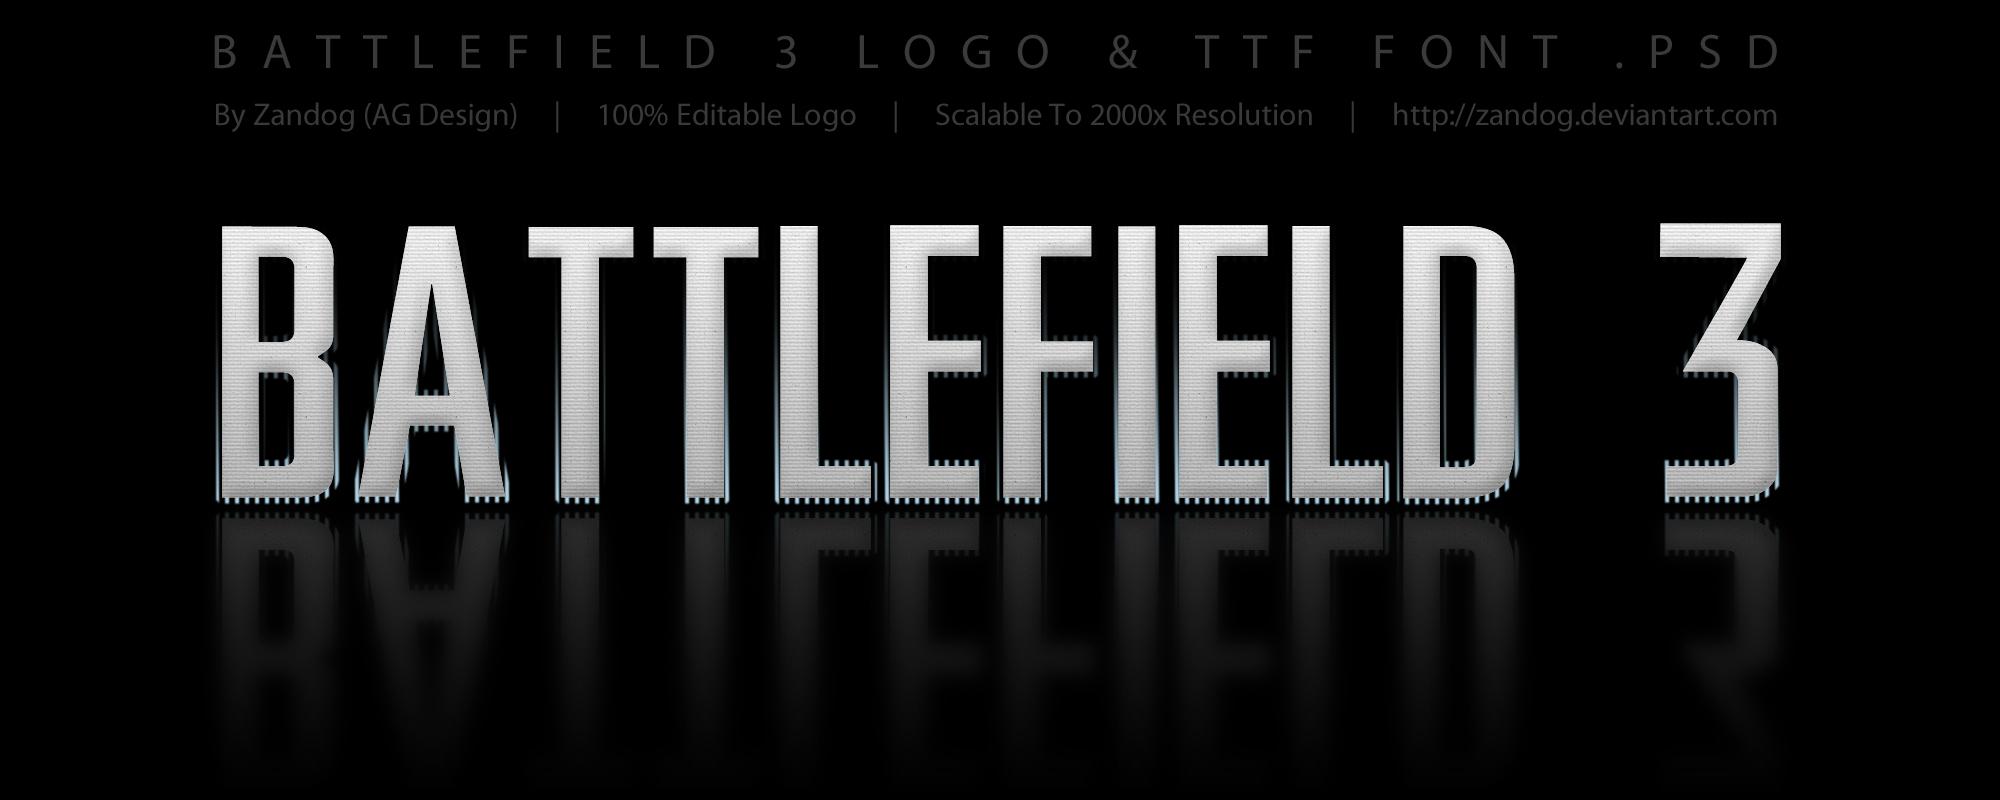 battlefield_3_logo__psd_by_zandog-d45nxmy